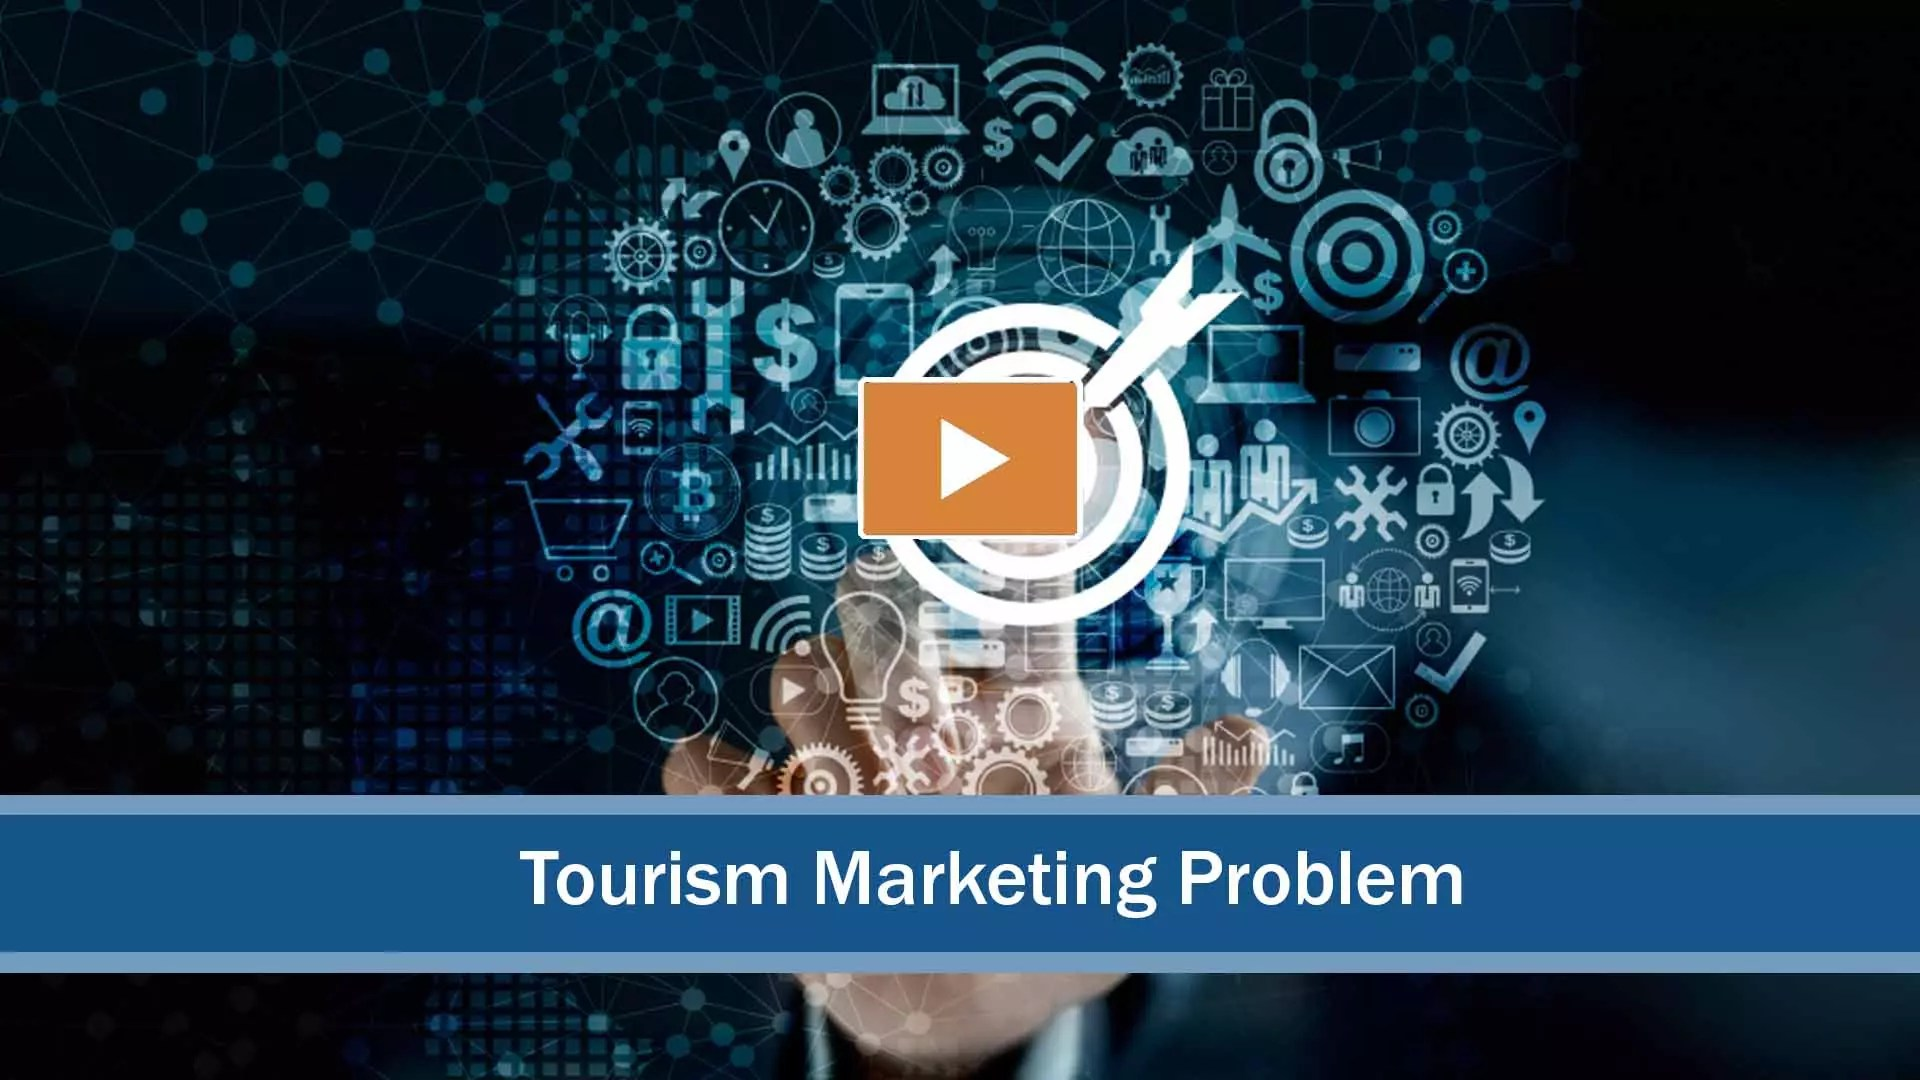 tourism target market - explaining why it isn't this.